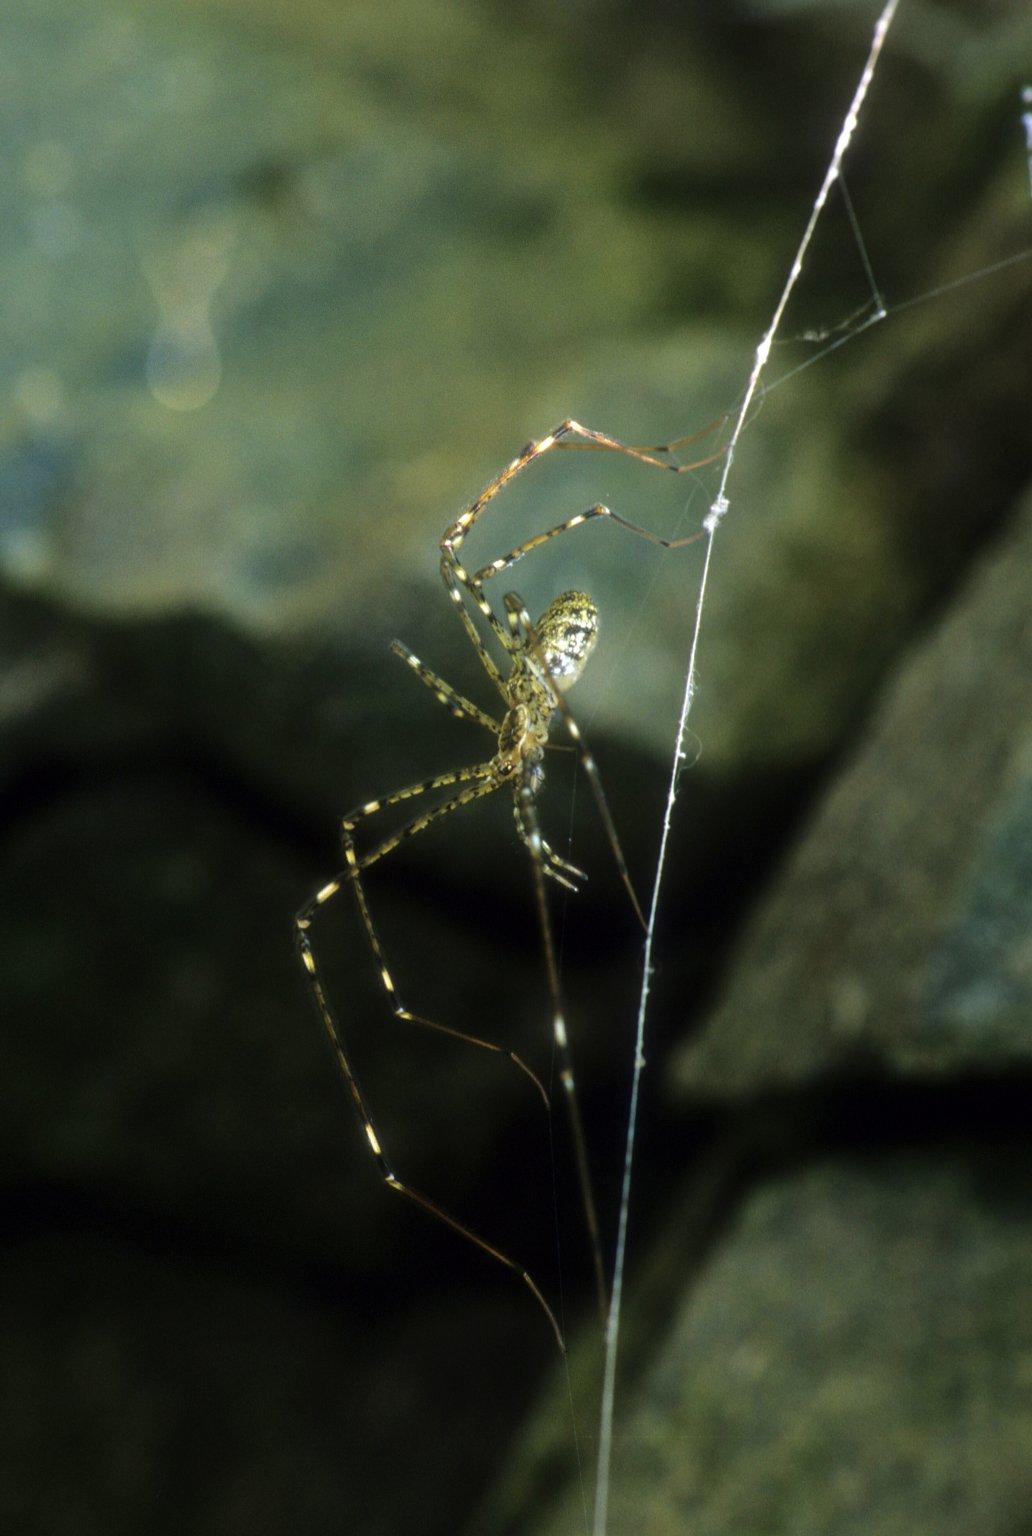 Lampshade spiderHypochilus sp (Hypochilidae)